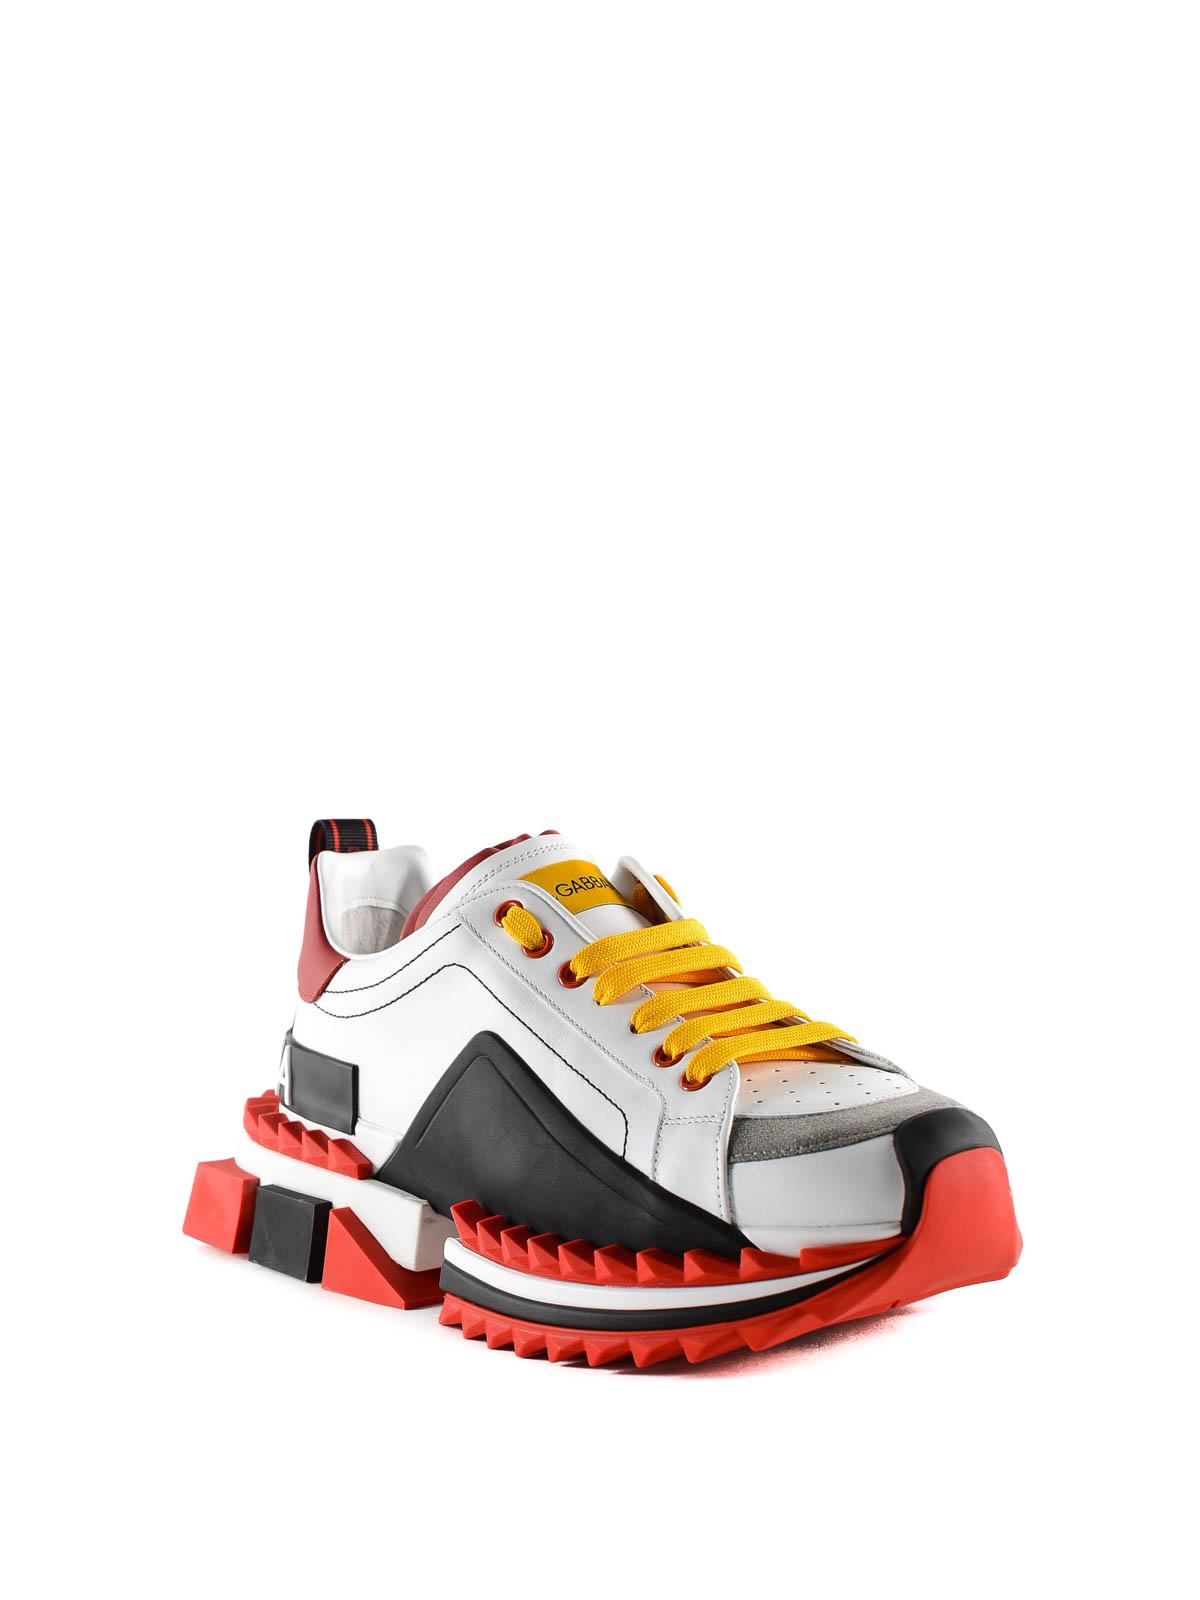 Dolce \u0026 Gabbana - Super King sneakers